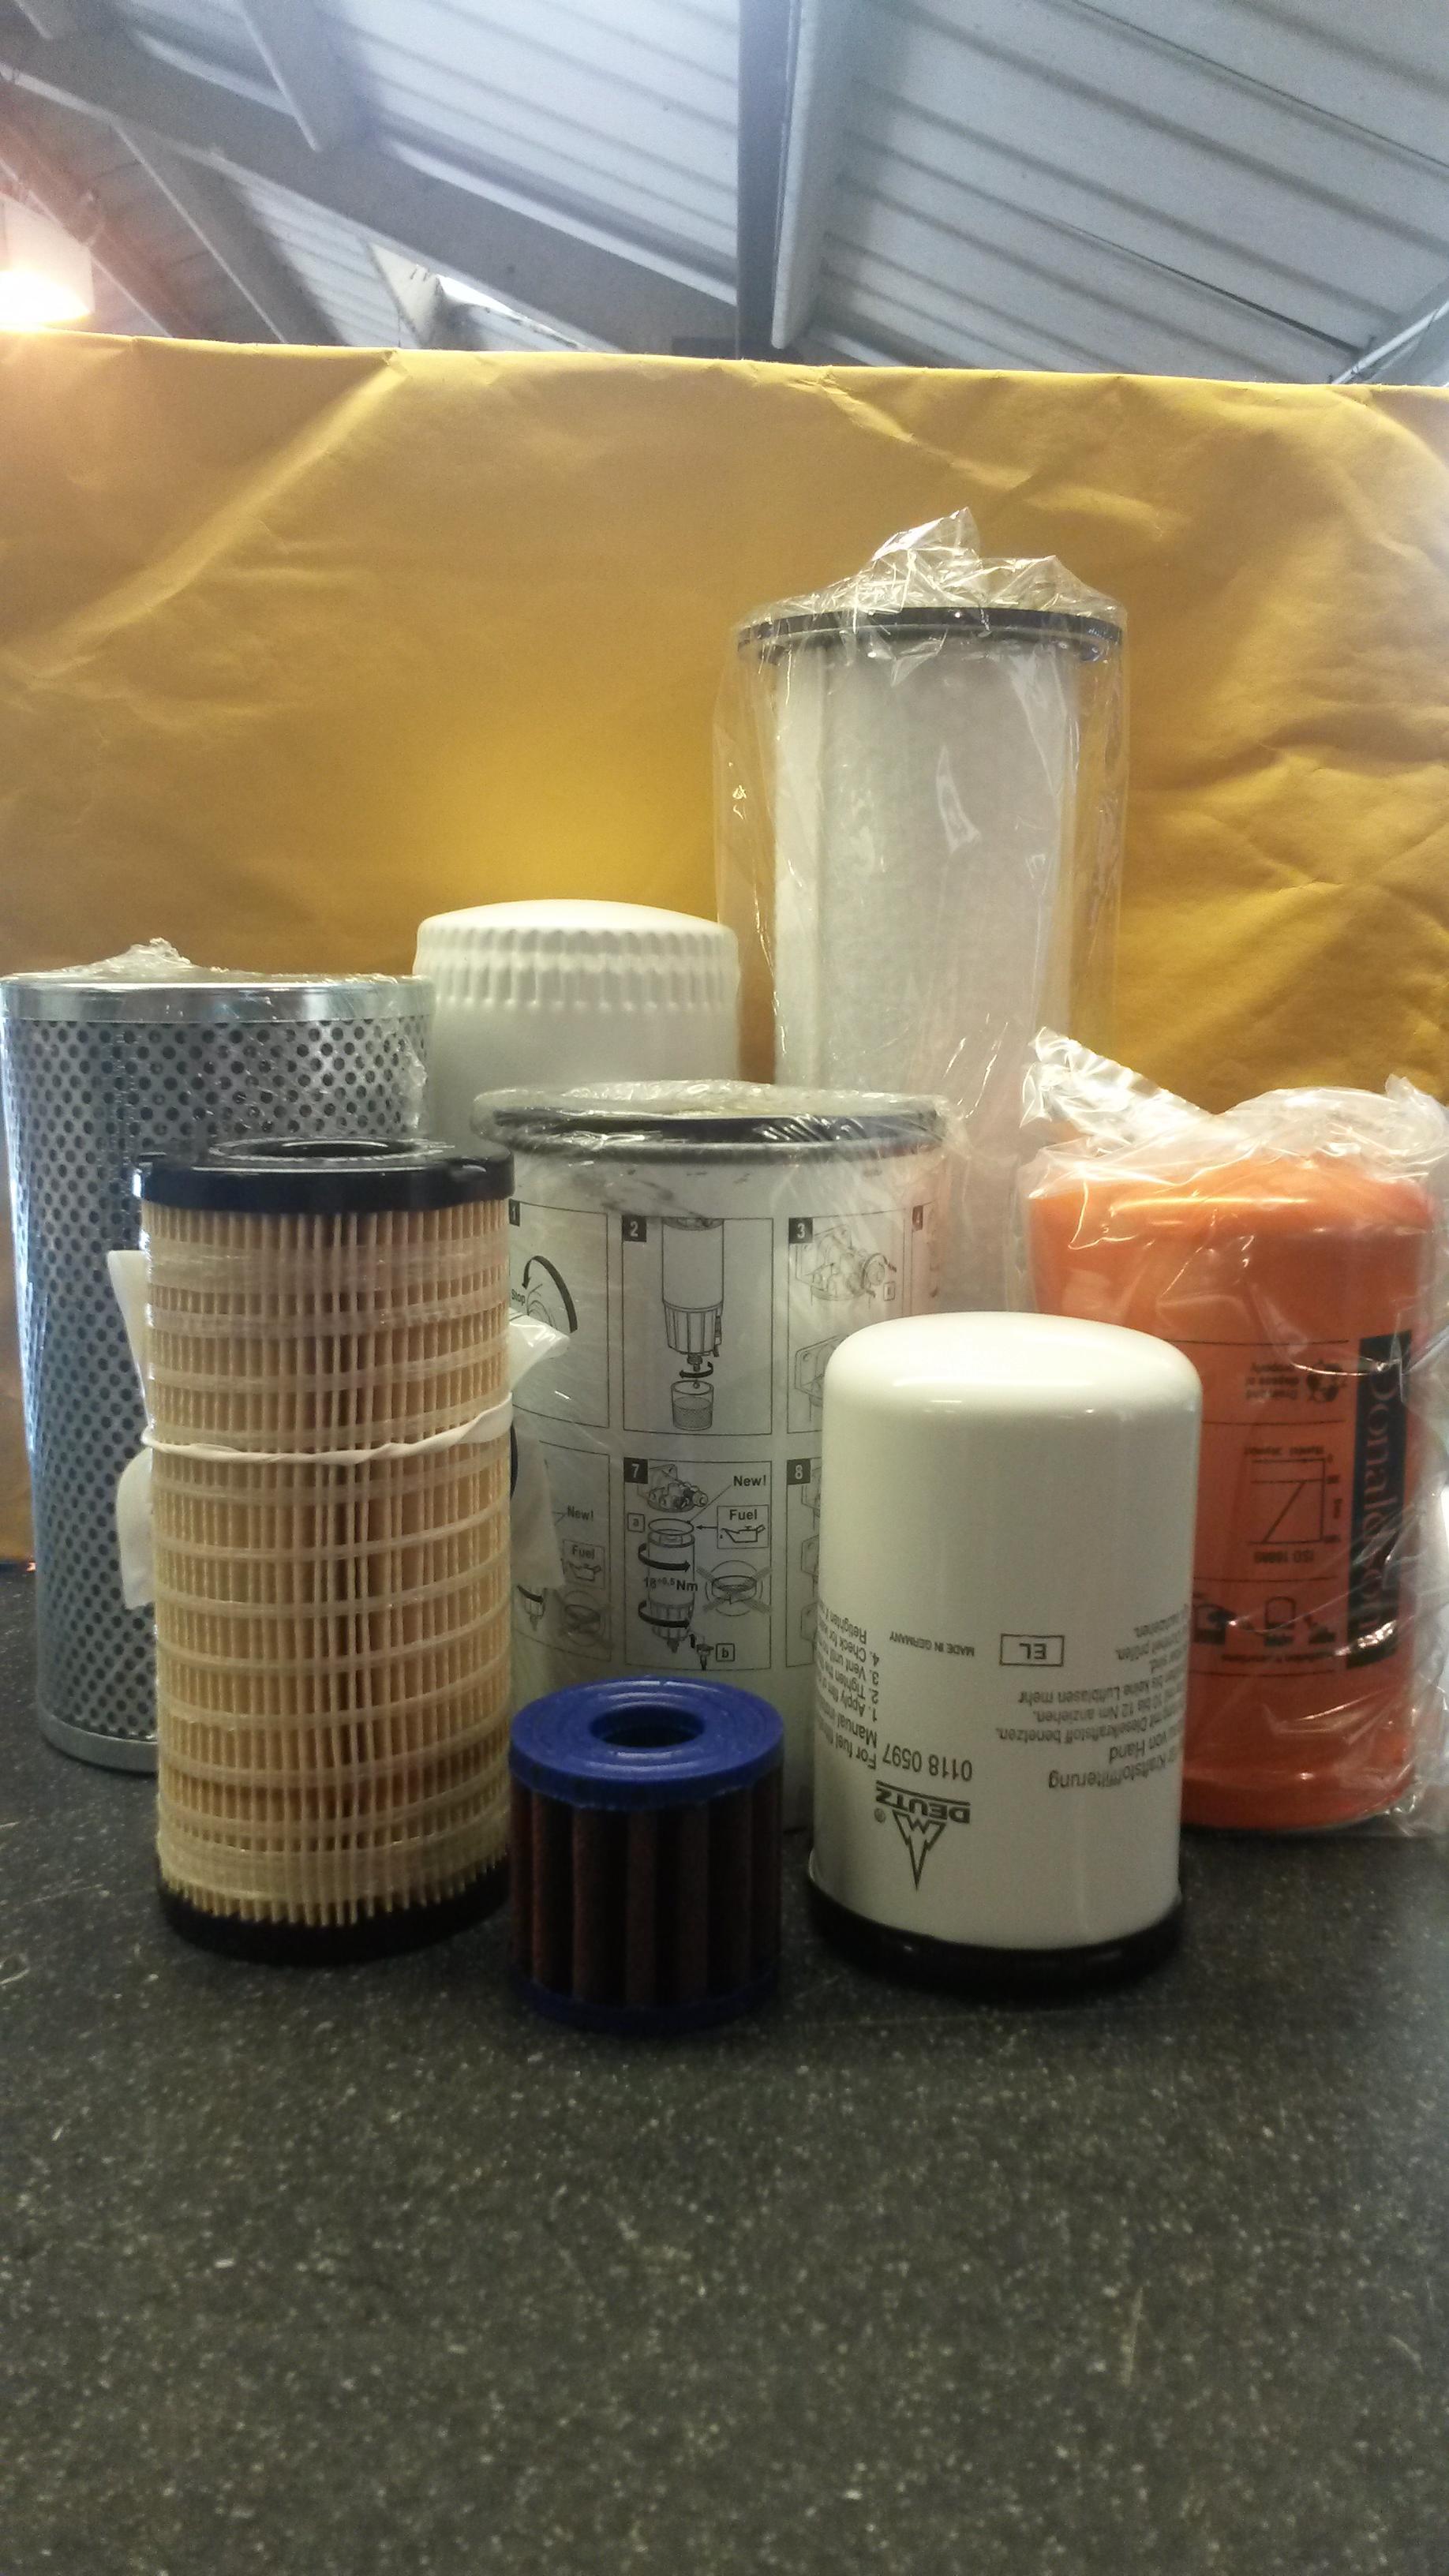 Merlo P32.12 Filter Service Kit